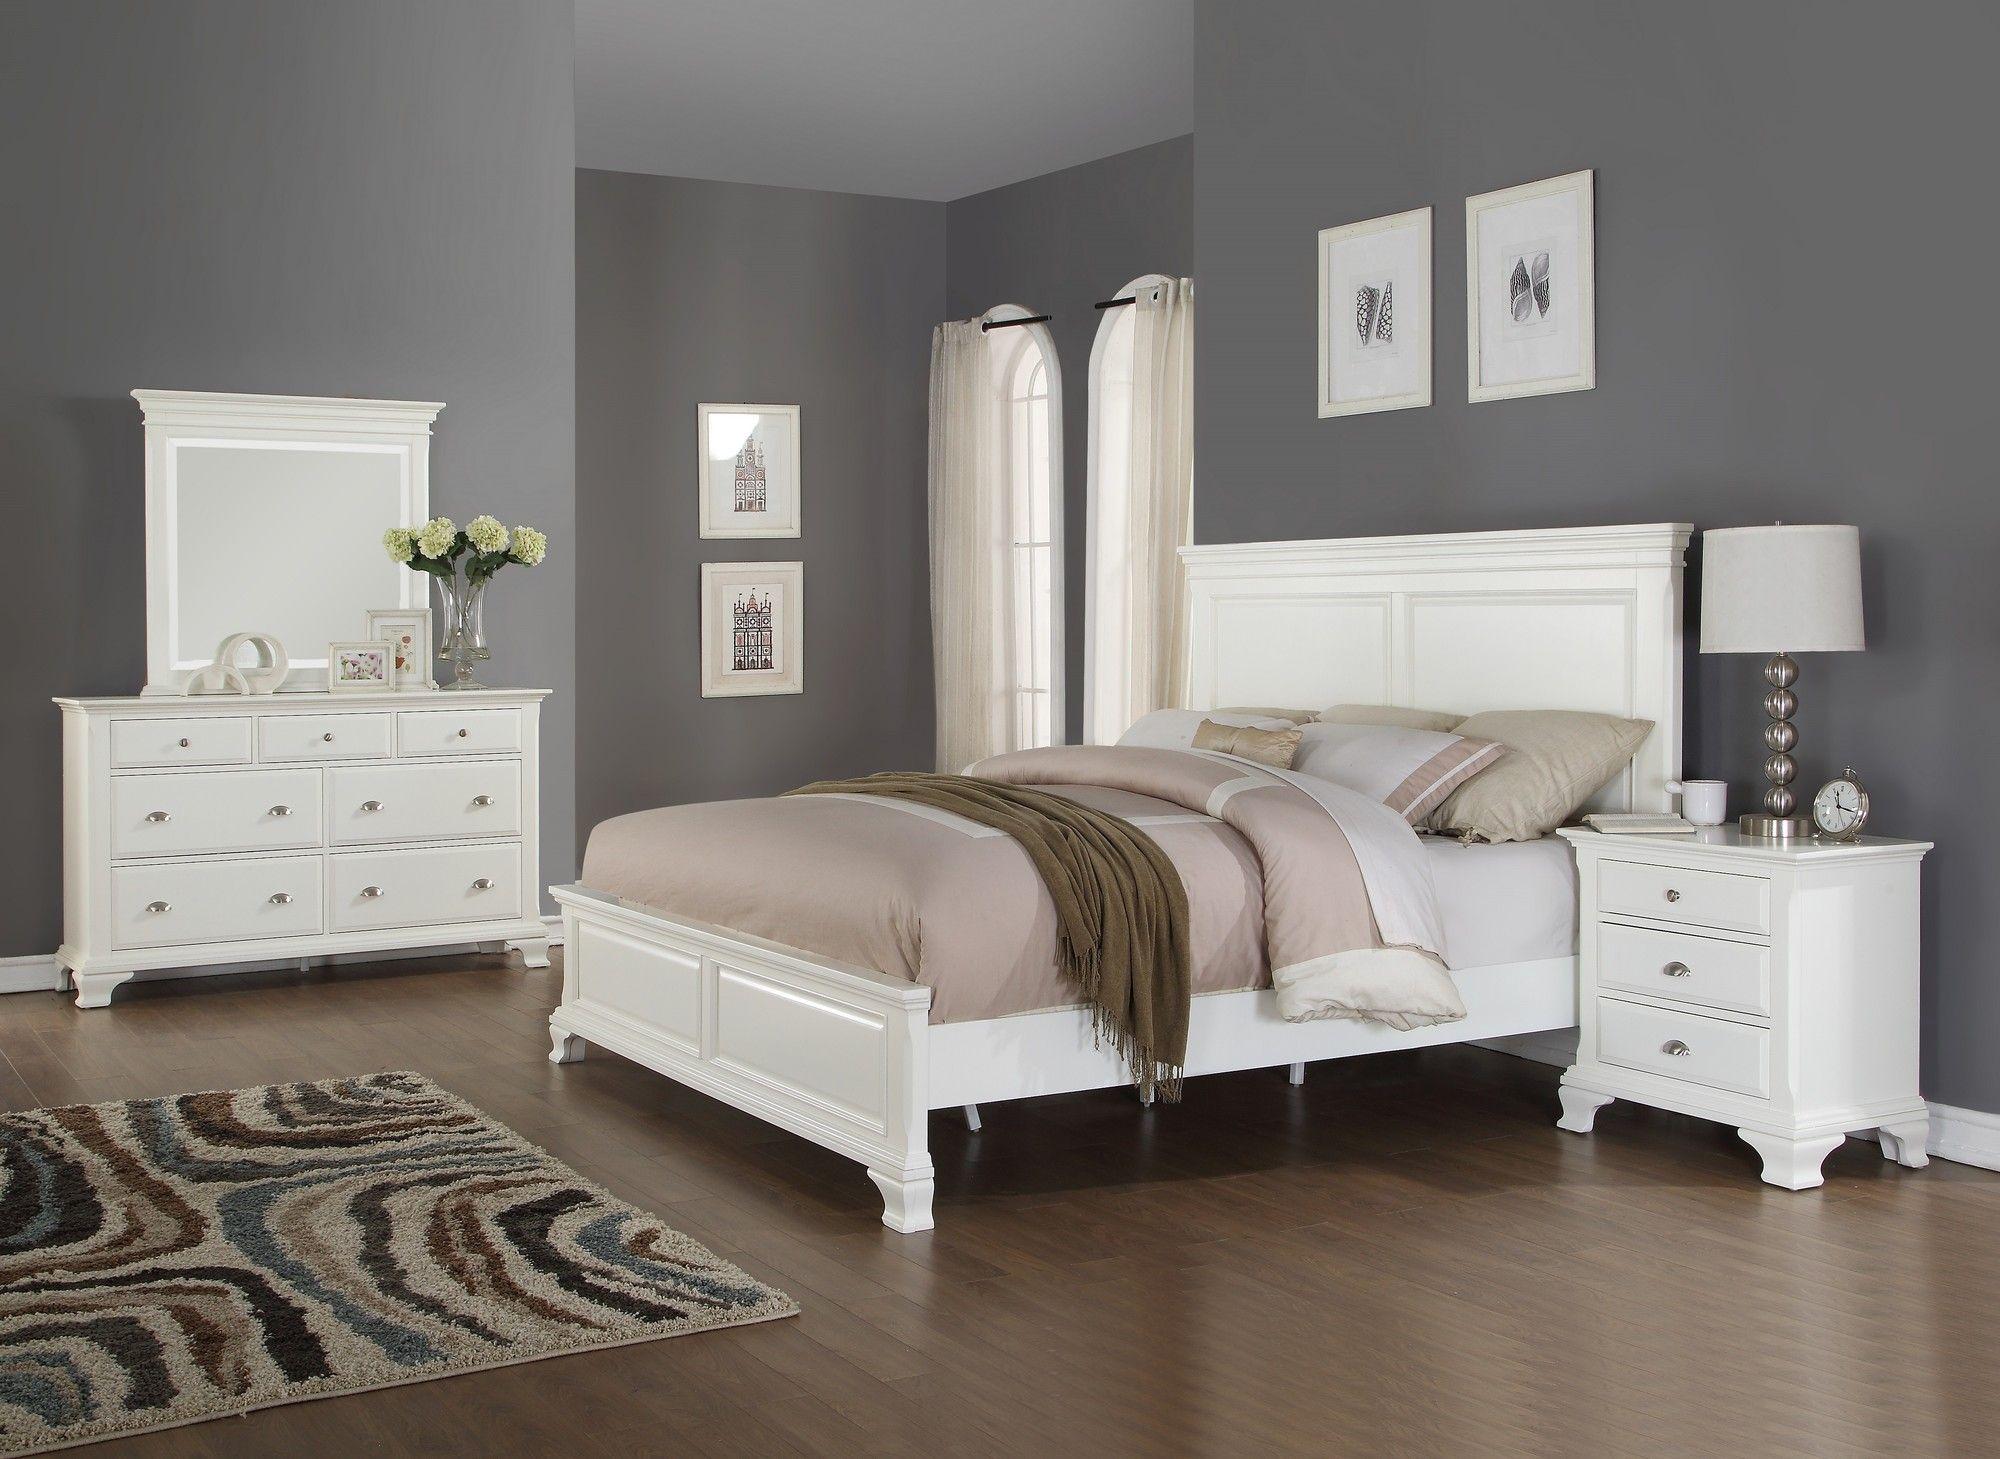 Fellsburg Panel 4 Piece Bedroom Set White Wood Bedroom Furniture